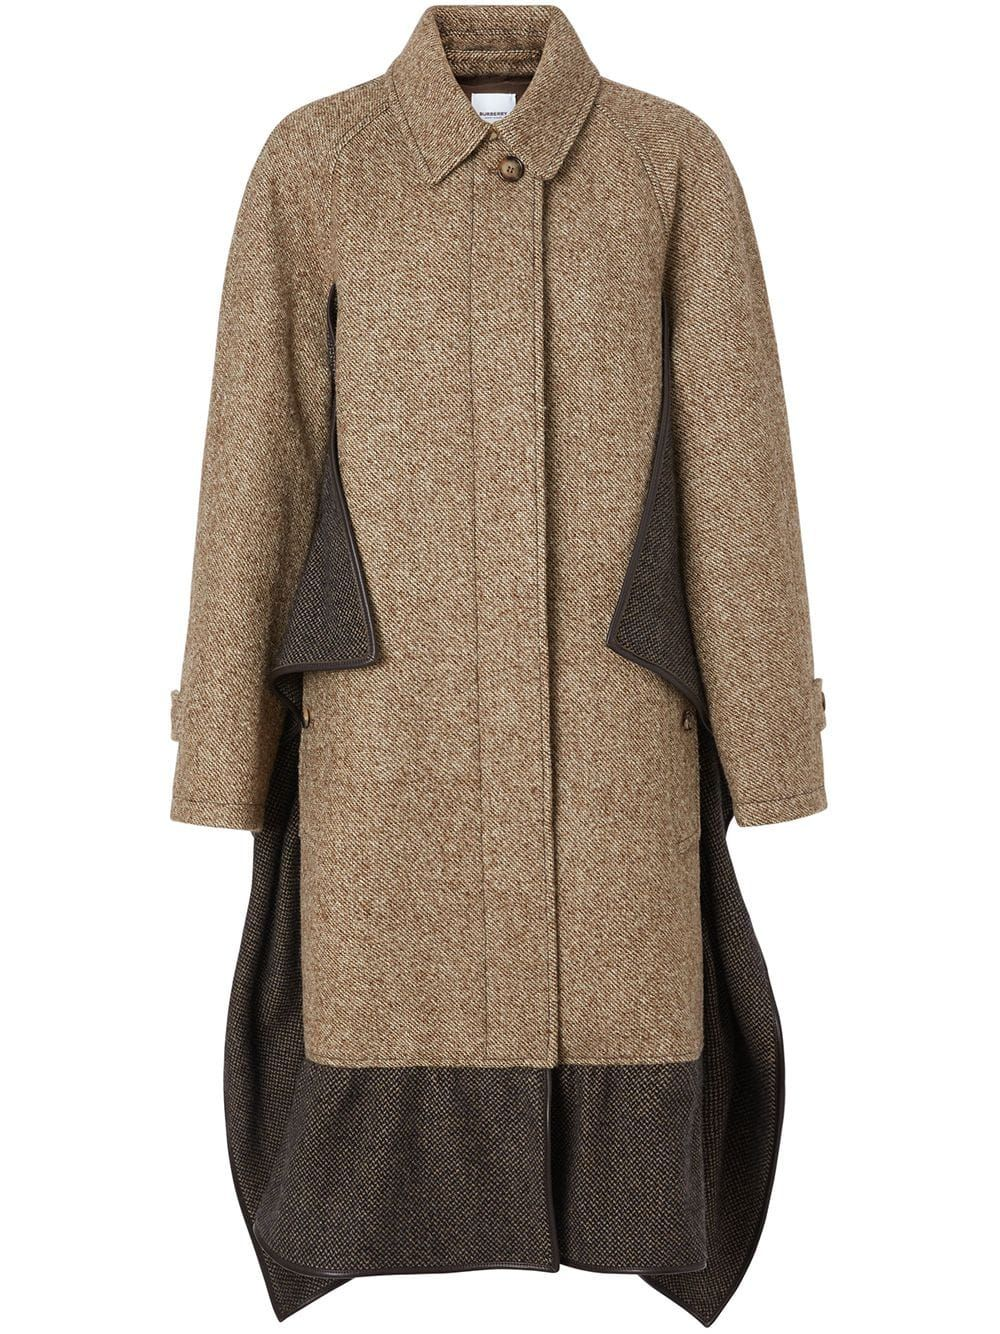 Photo of Burberry Scarf Detail Wool Mohair Tweed Car Coat